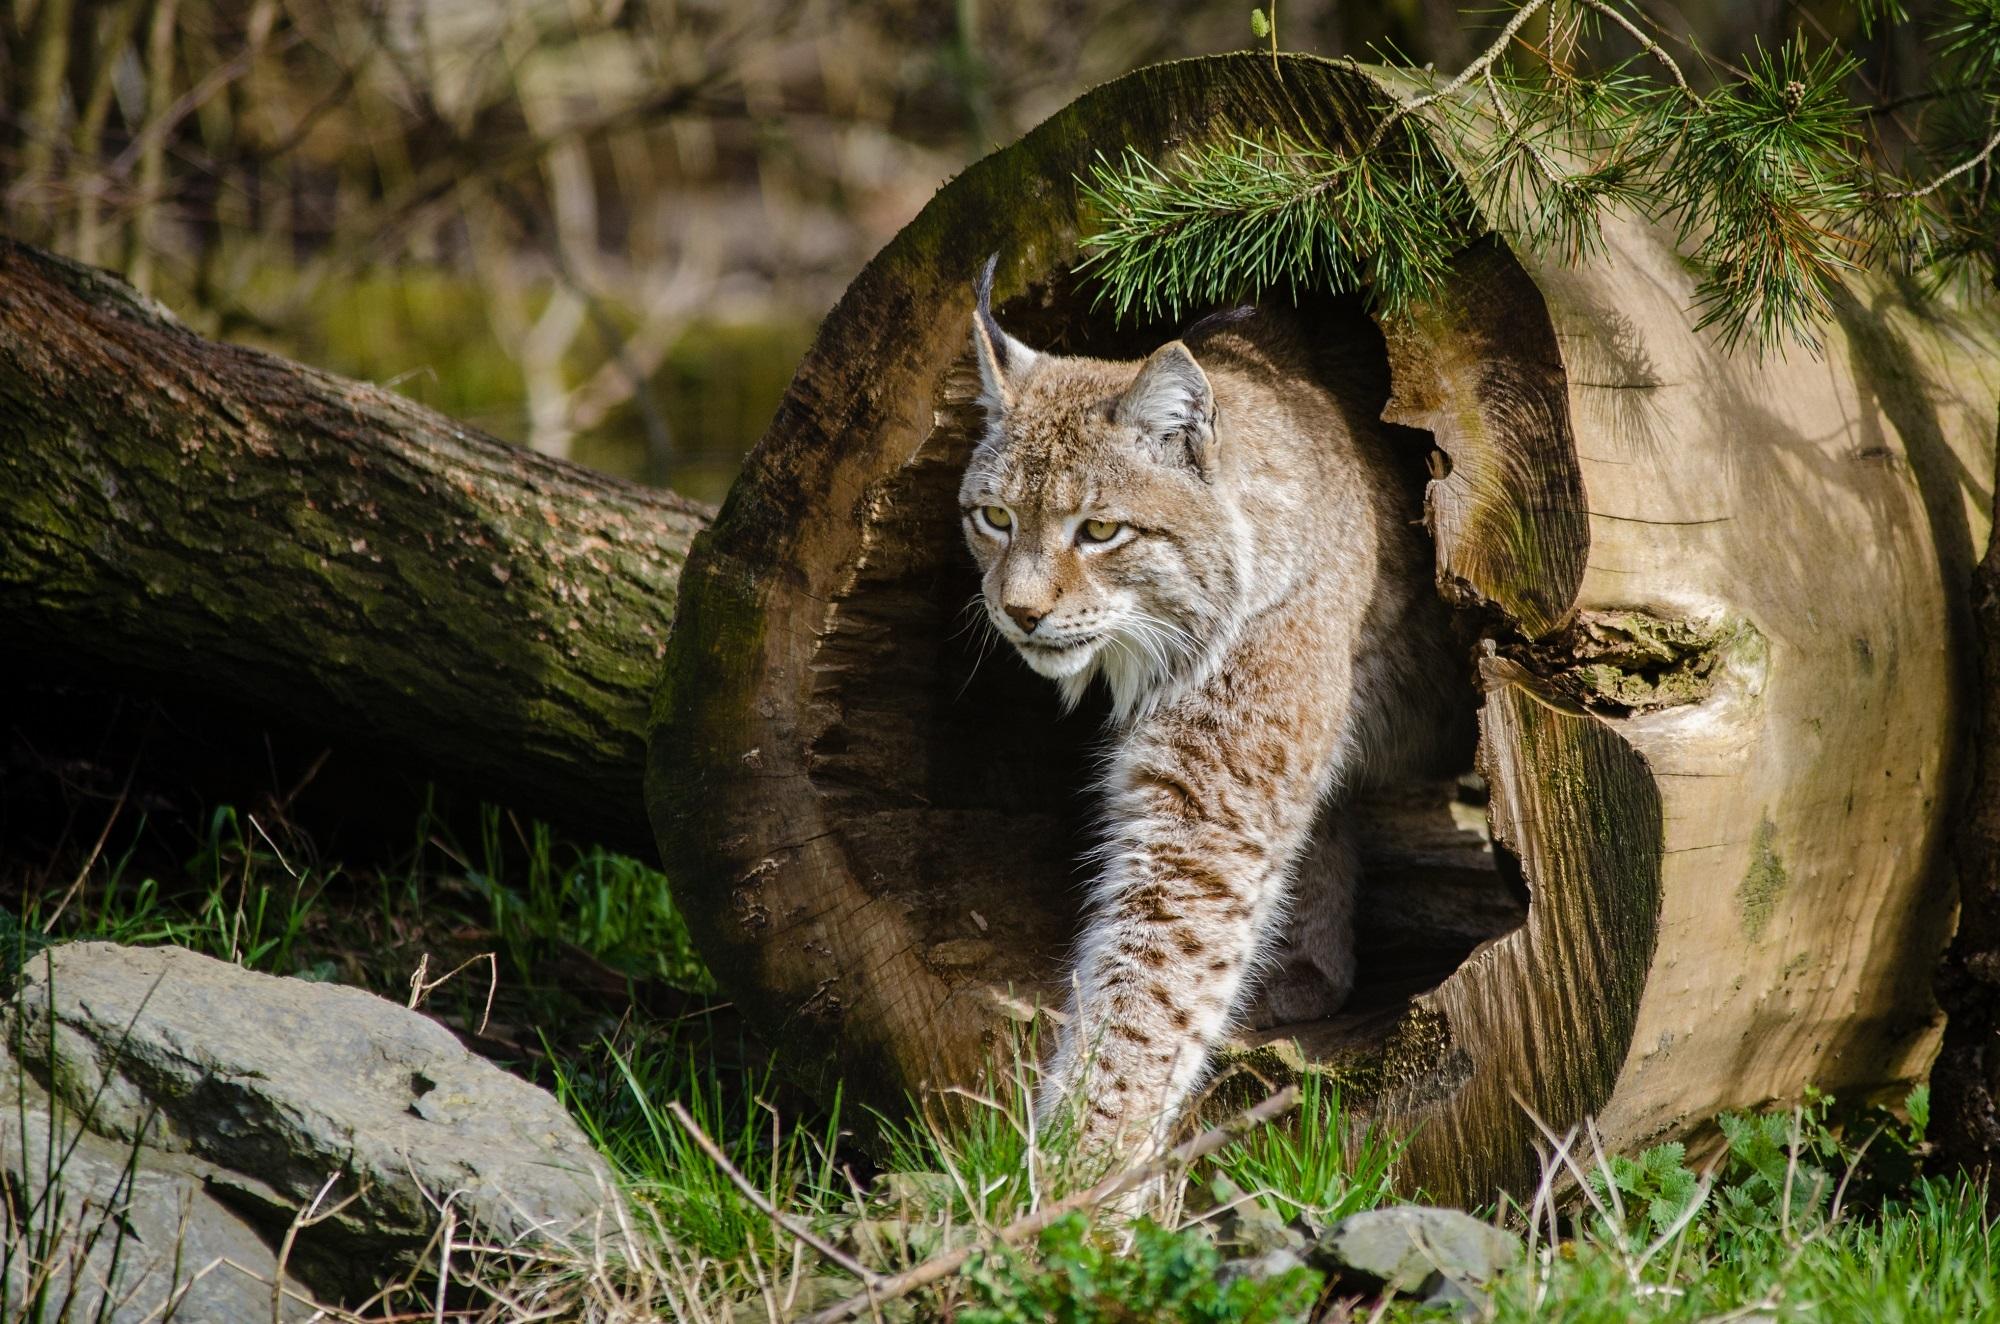 Lynx in the jungle photo